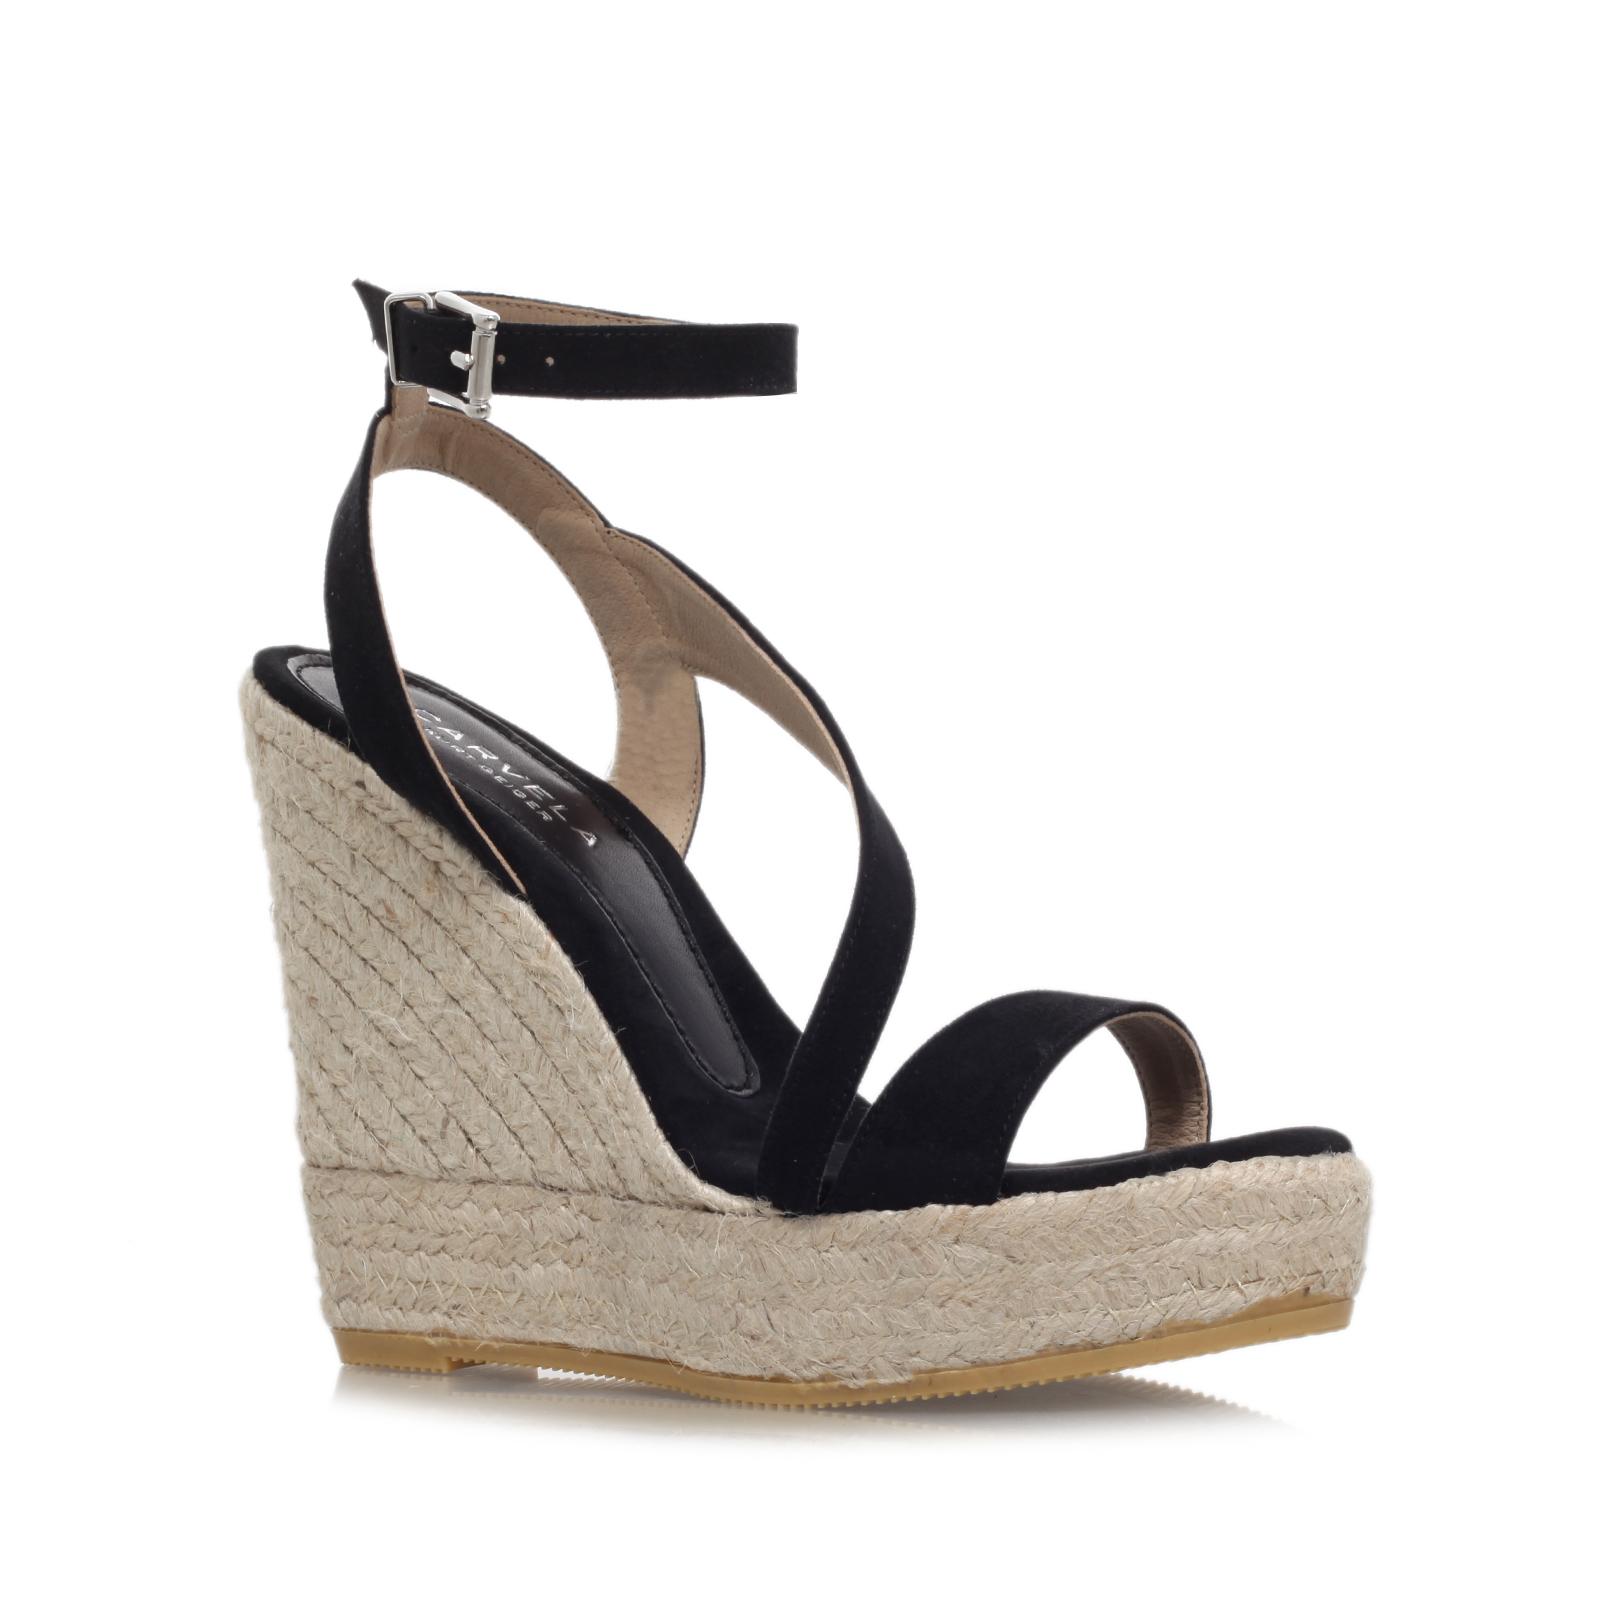 064e7a25f1 Carvela Kurt Geiger Klassy High Wedge Heel Strappy Sandals in Black ...